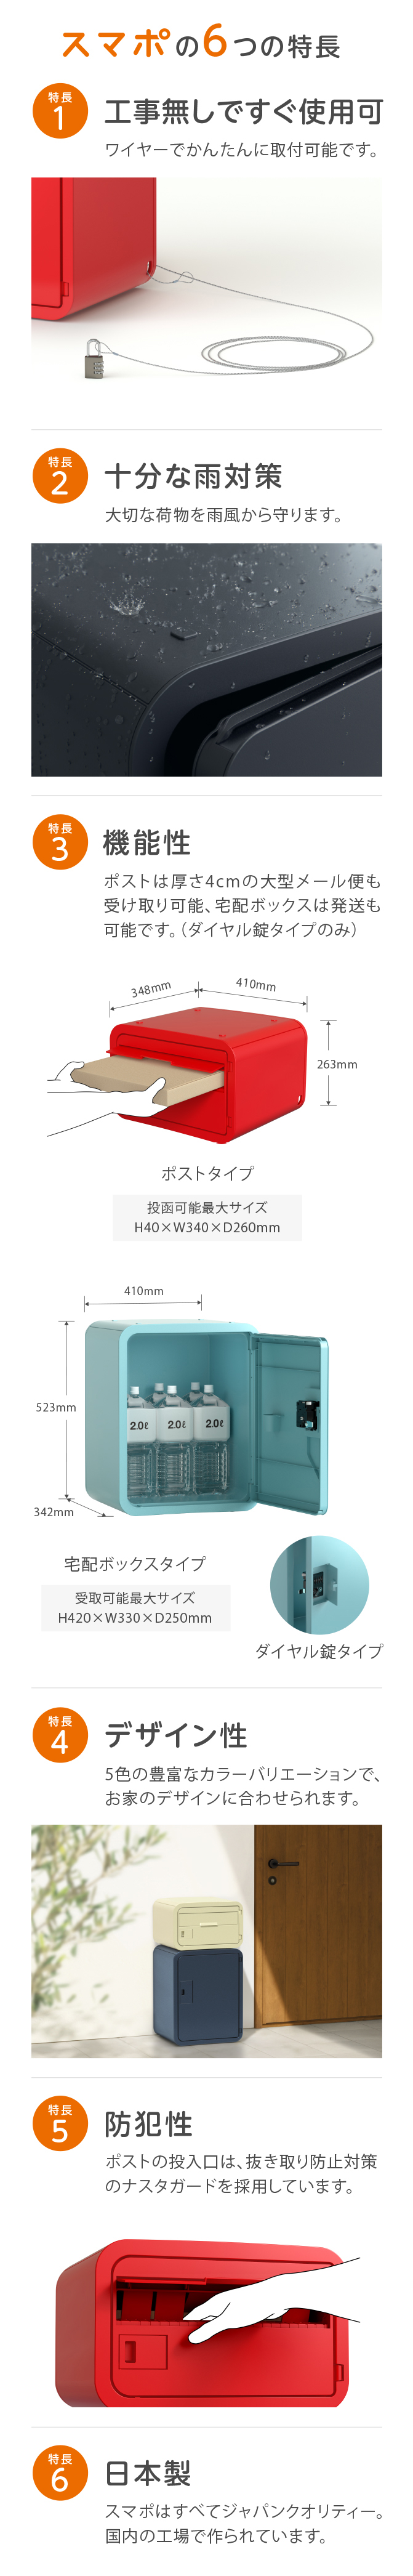 設置工事不要/防滴仕様で屋外可/機能性/デザイン性/防犯性/日本製